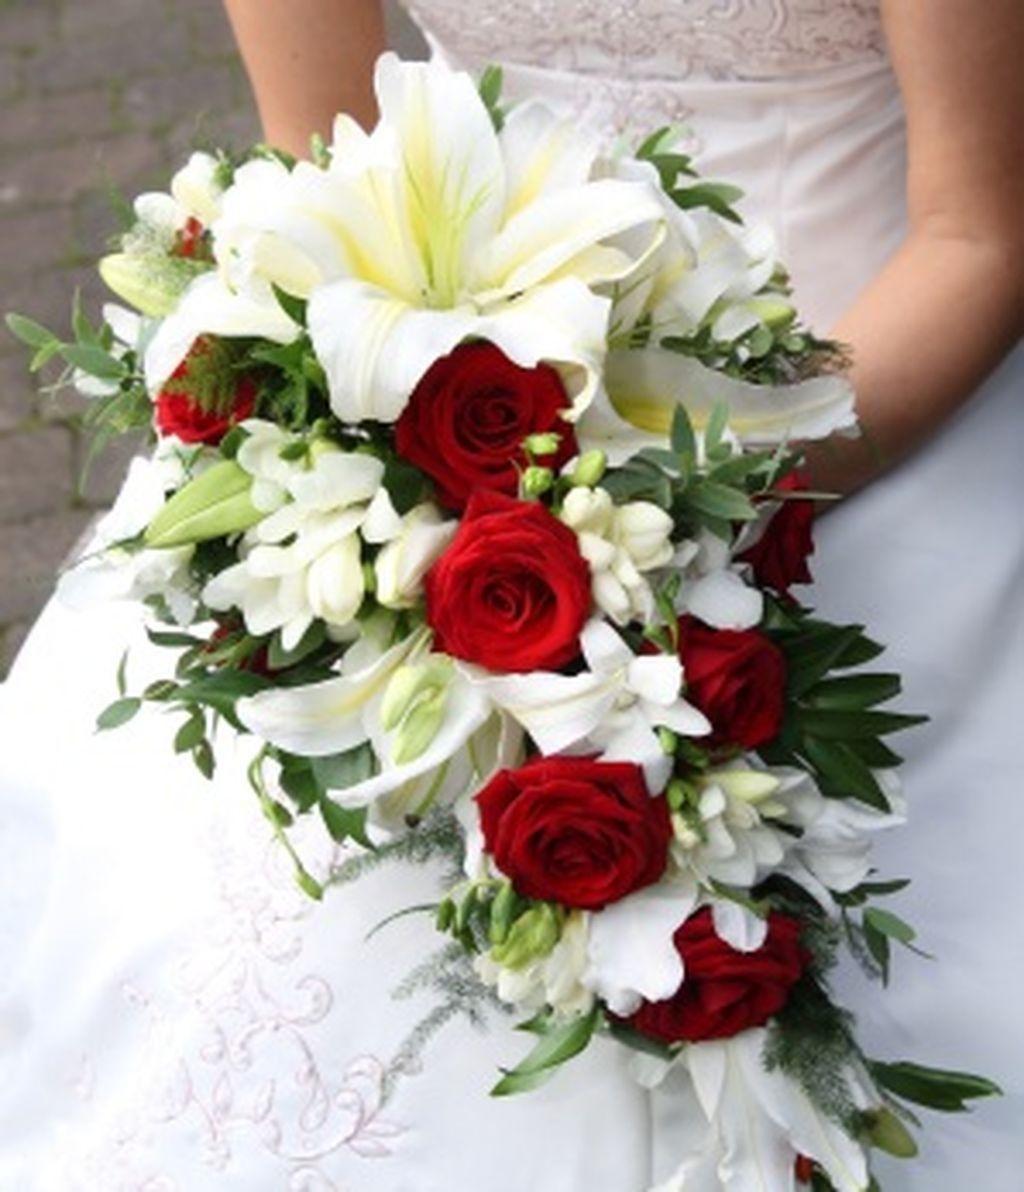 Wedding decorations beach december 2018  Beautiful Red Winter Wedding Flowers Ideas  Red winter weddings